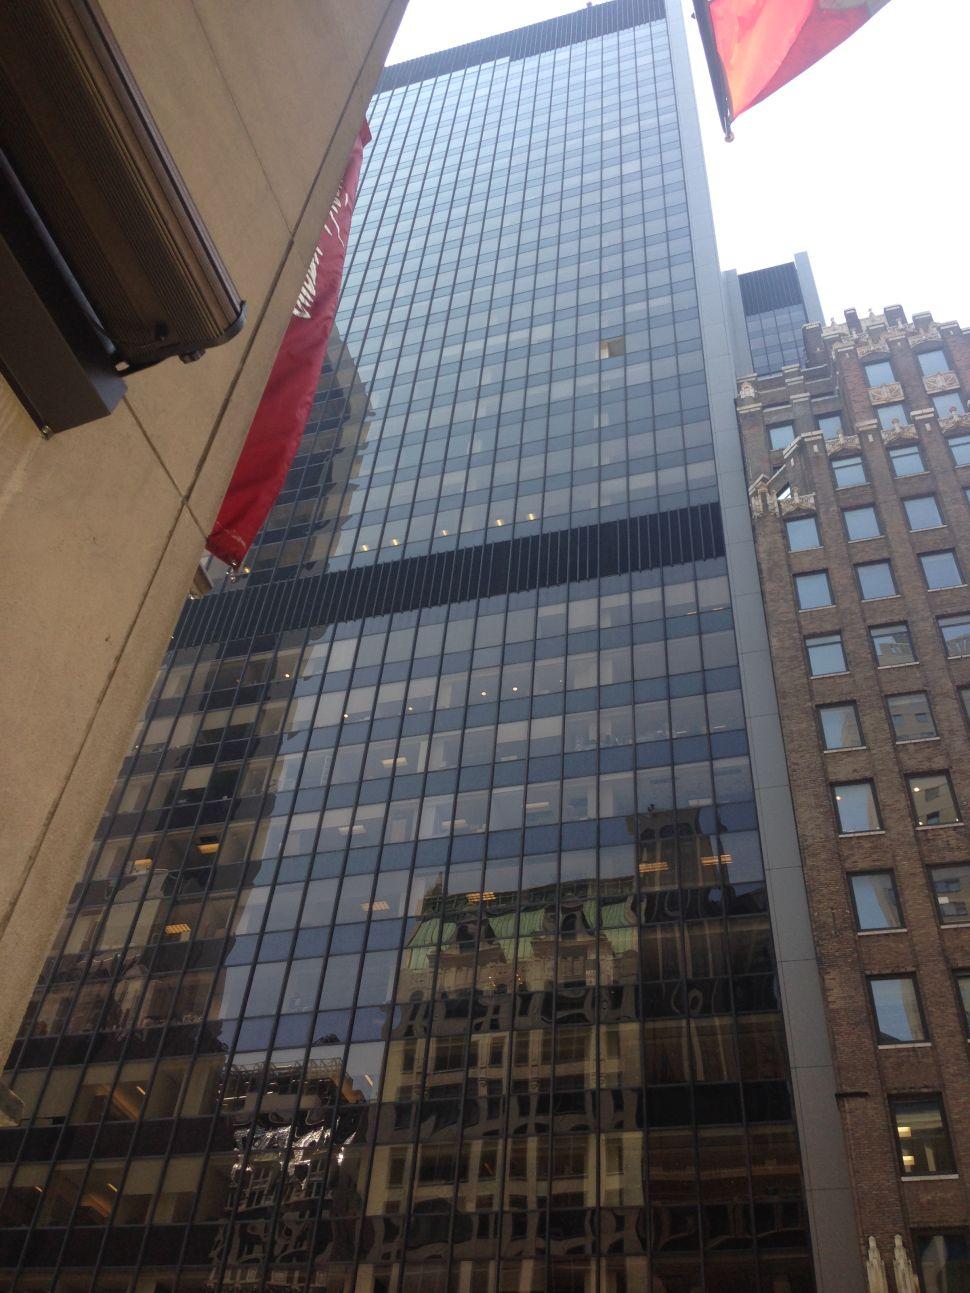 Broken Skyscraper Window Showers Glass Onto W. 57th Street, Injures 3